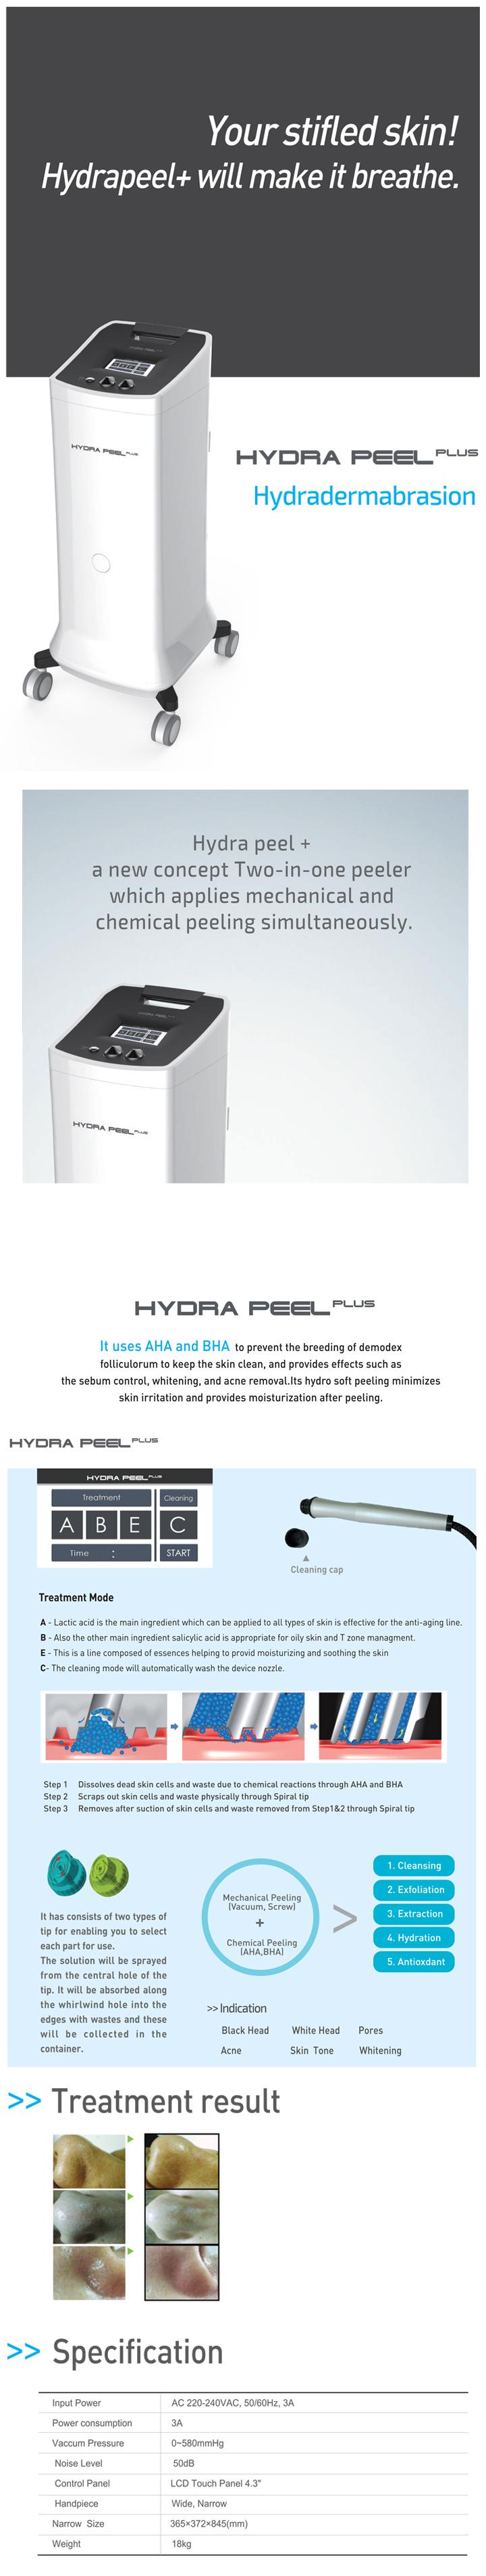 hydrapeel